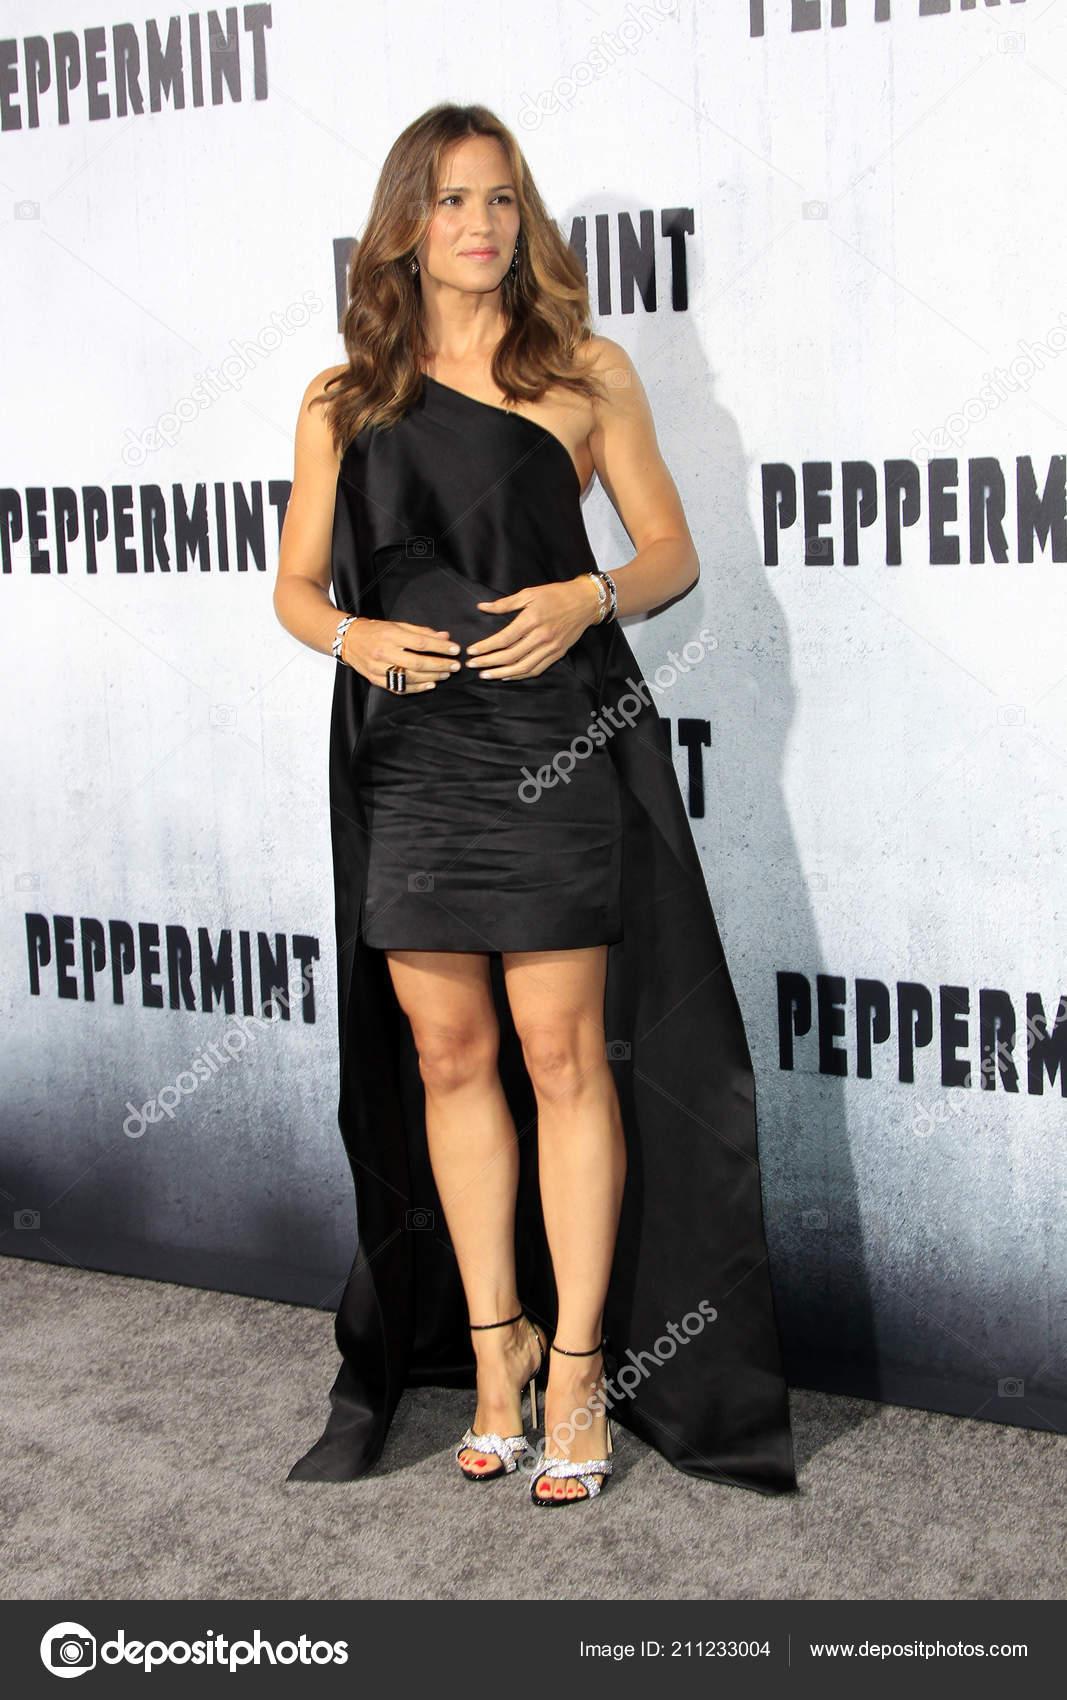 Pics Jennifer Garner nudes (92 foto and video), Ass, Fappening, Twitter, braless 2020